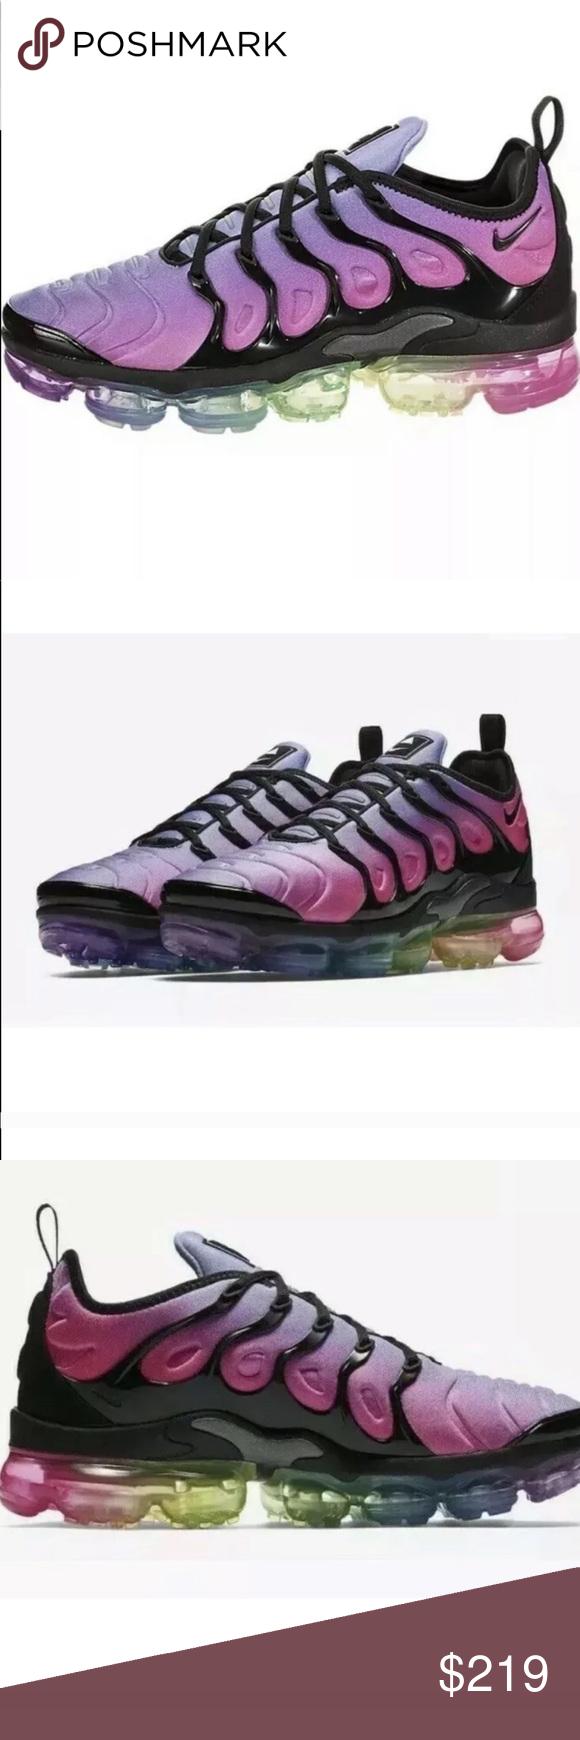 Nike Shoes Air Vapormax Pink White